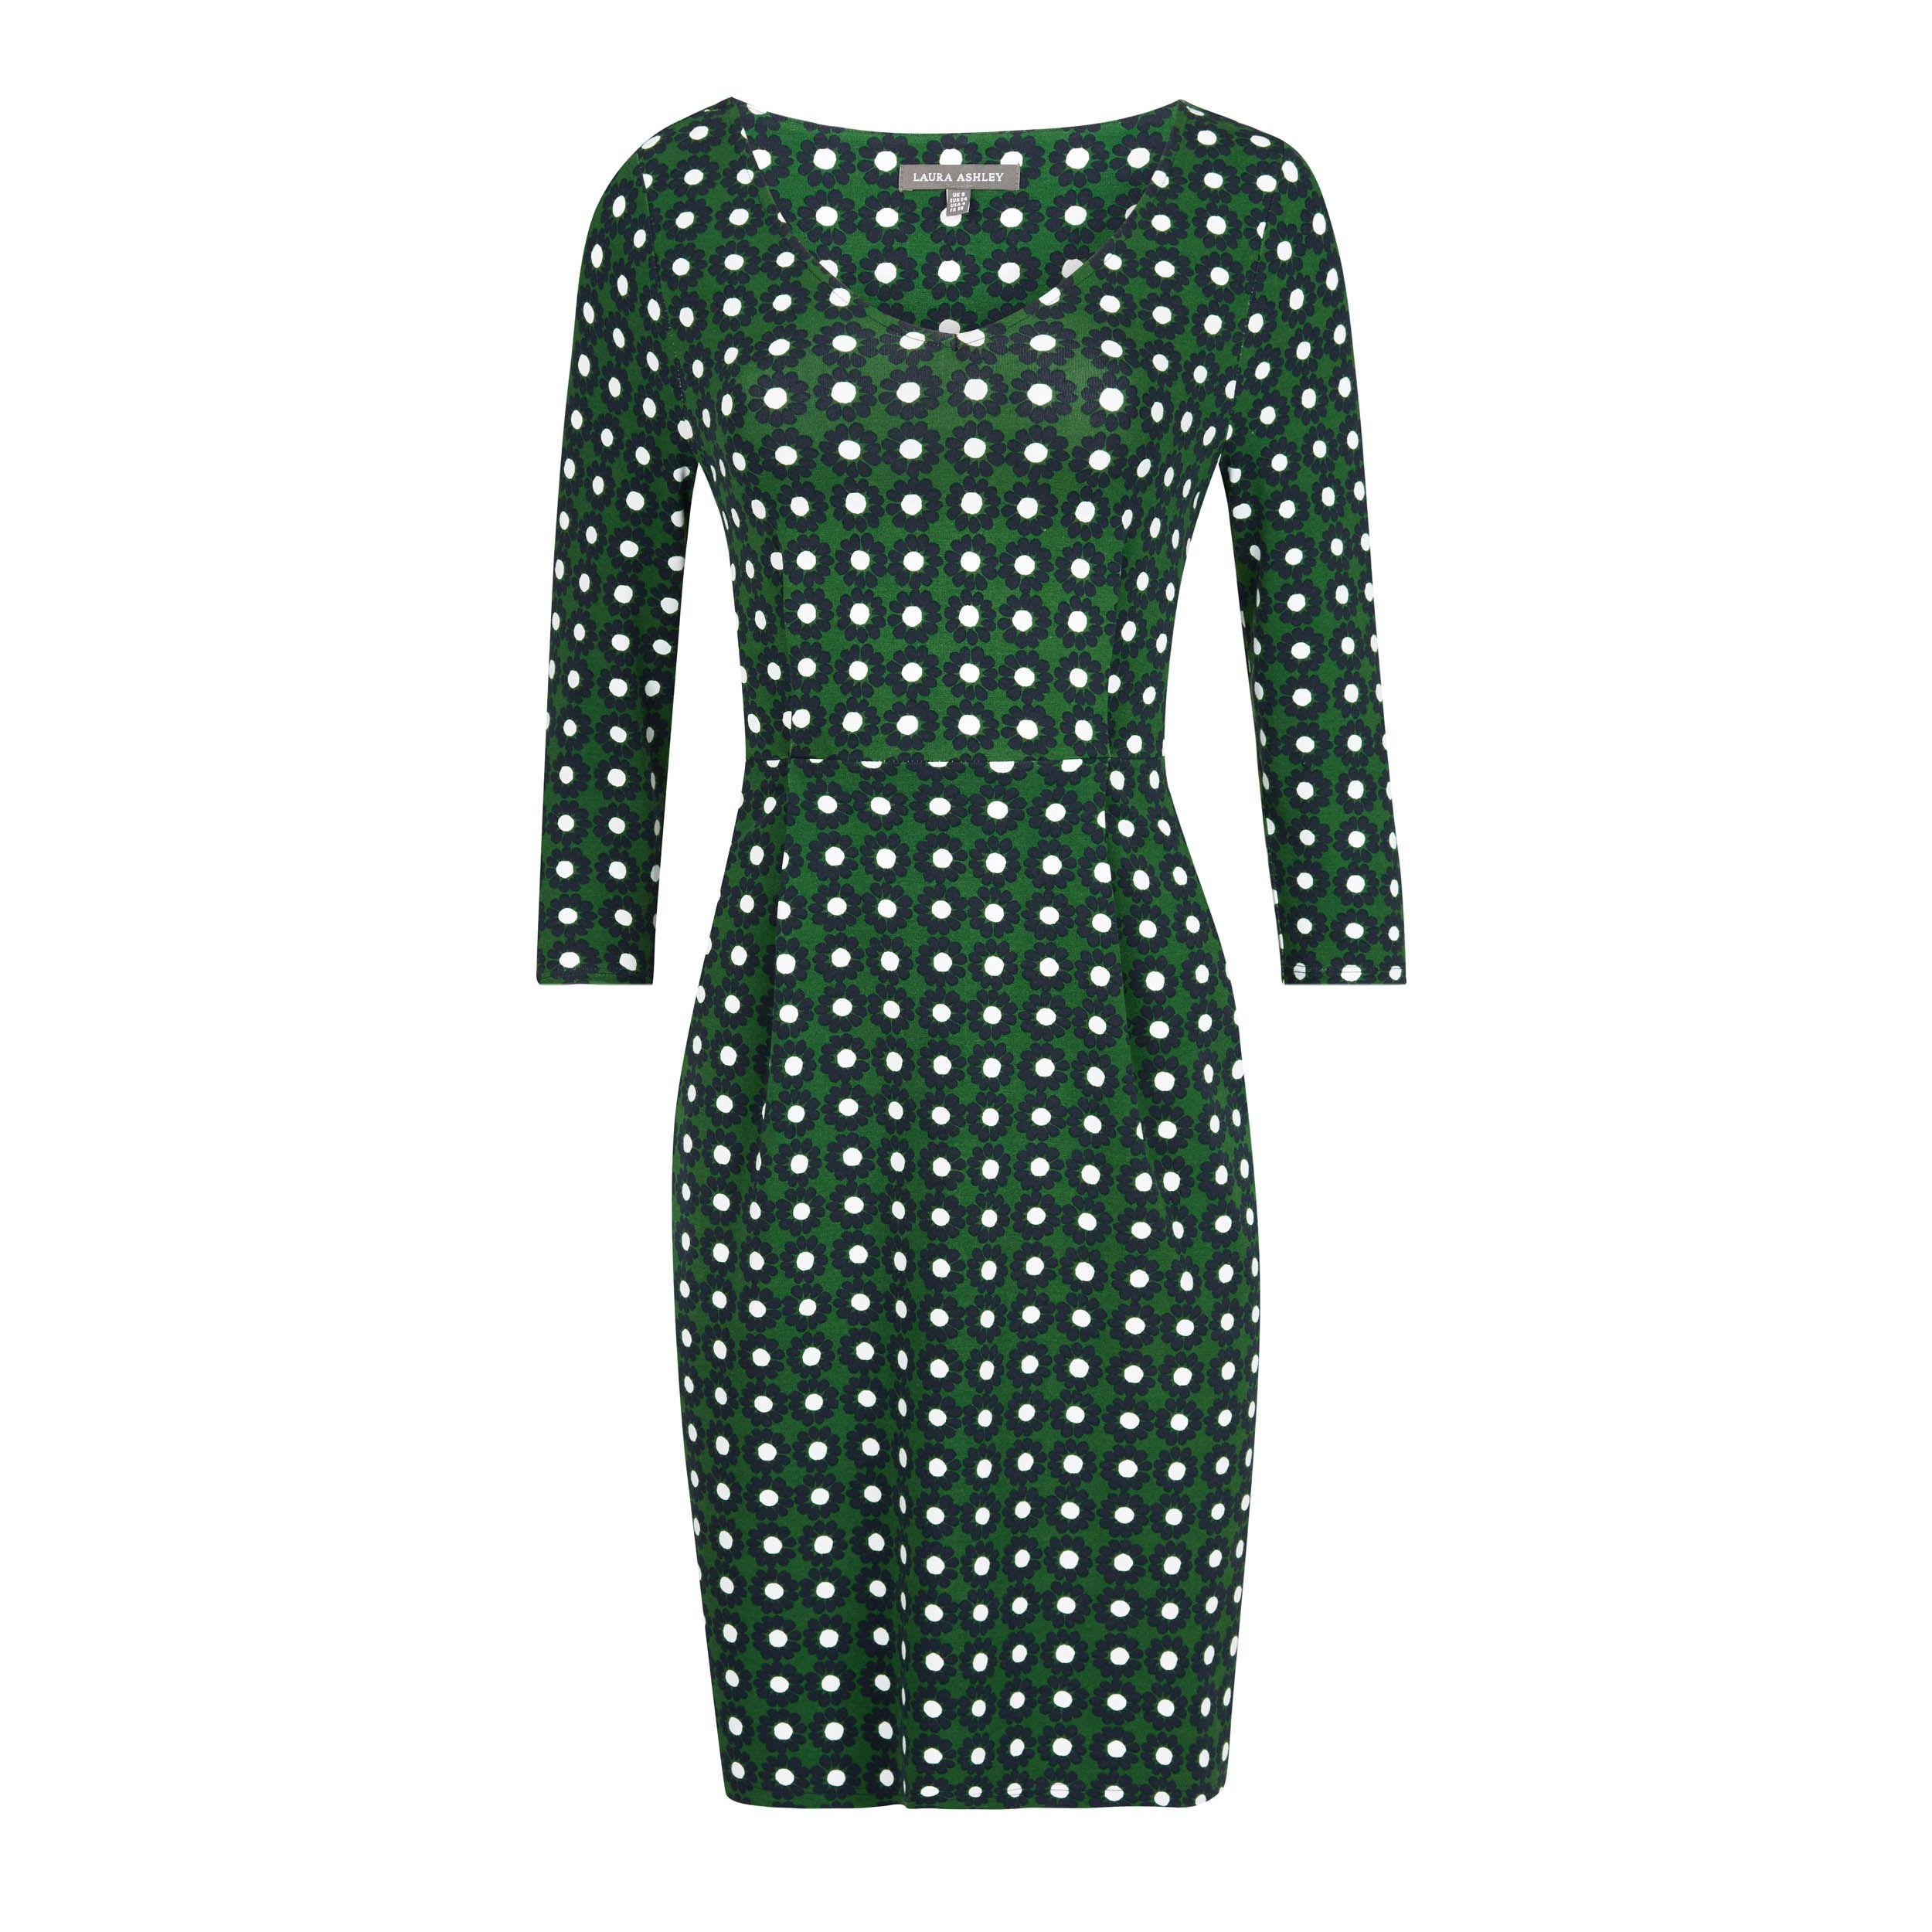 75805dfc8 vestido verde con margaritas azules